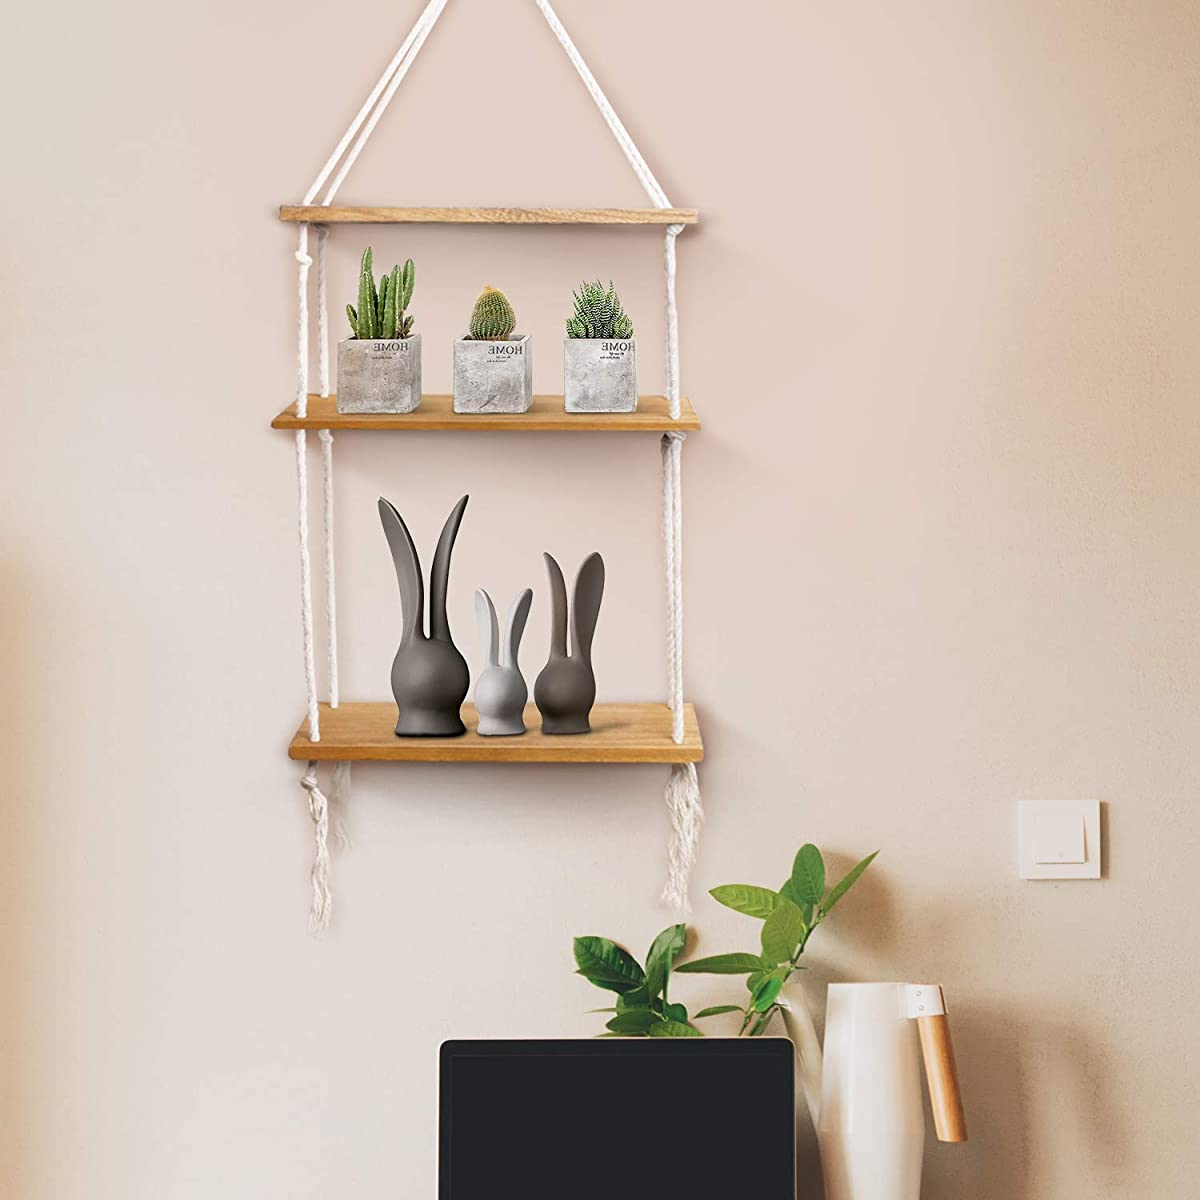 Surophy Floating Wood Shelves, 3-Tier Wall Mount Hanging Shelves Book Shelves Industrial Wood Book Shelves Storage, Display & Decor for Bedroom, Living Room, Dining Room, Kitchen, Bedroom, Home